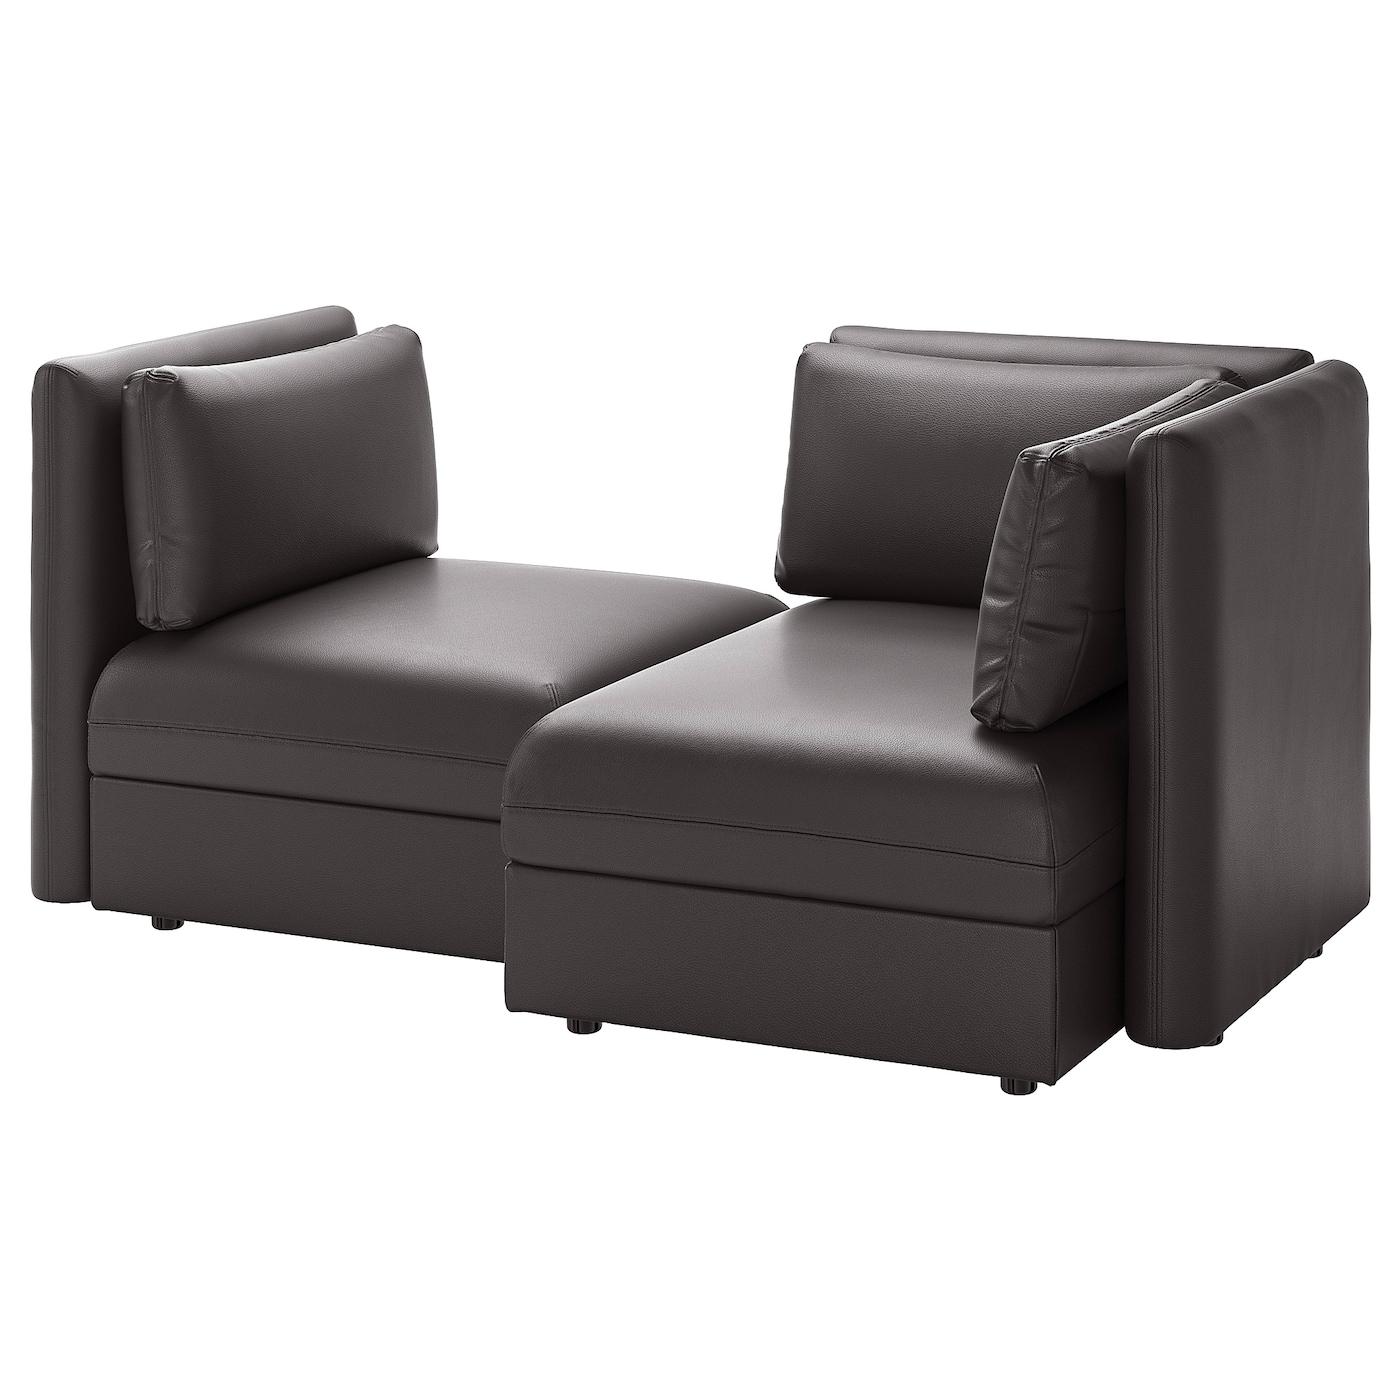 Vallentuna 2 Seat Modular Sofa With Storage Murum Black